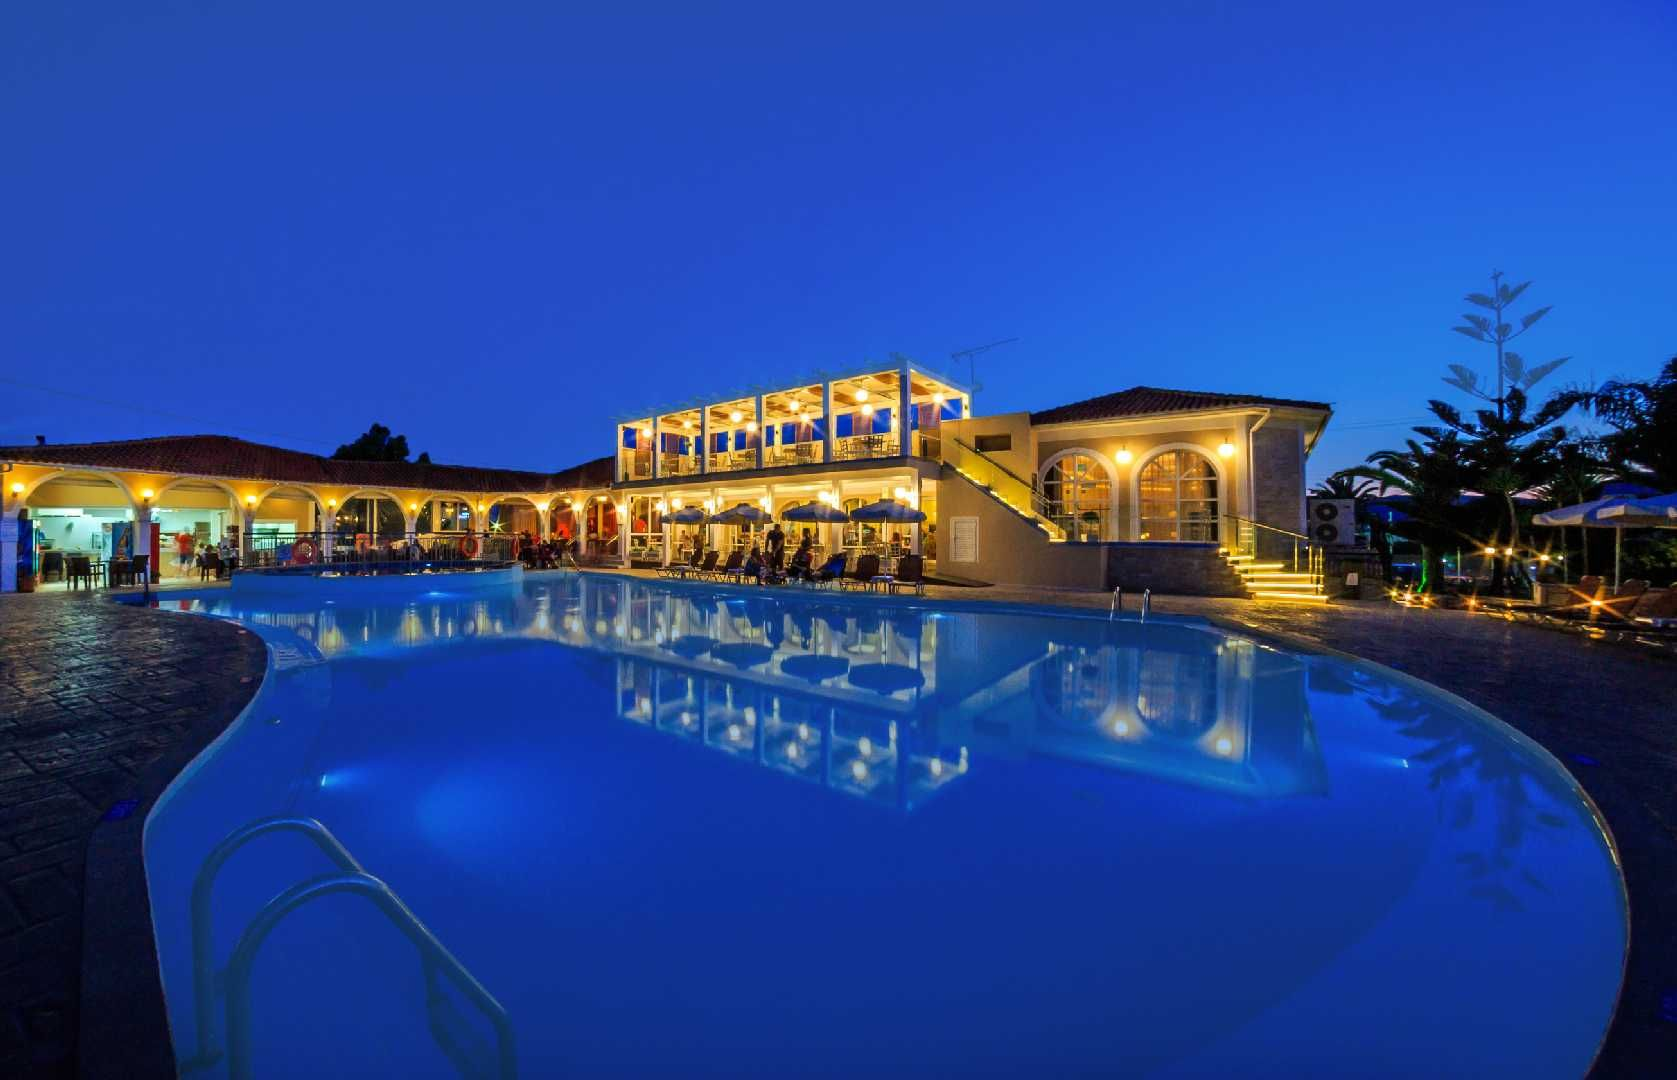 4* Marelen Hotel - Ζάκυνθος ✦ 2 Ημέρες (1 Διανυκτέρευση) ✦ 2 άτομα ✦ Πρωινό ✦ 01/07/2021 έως 31/08/2021 ✦ Κοντά στην παραλία!